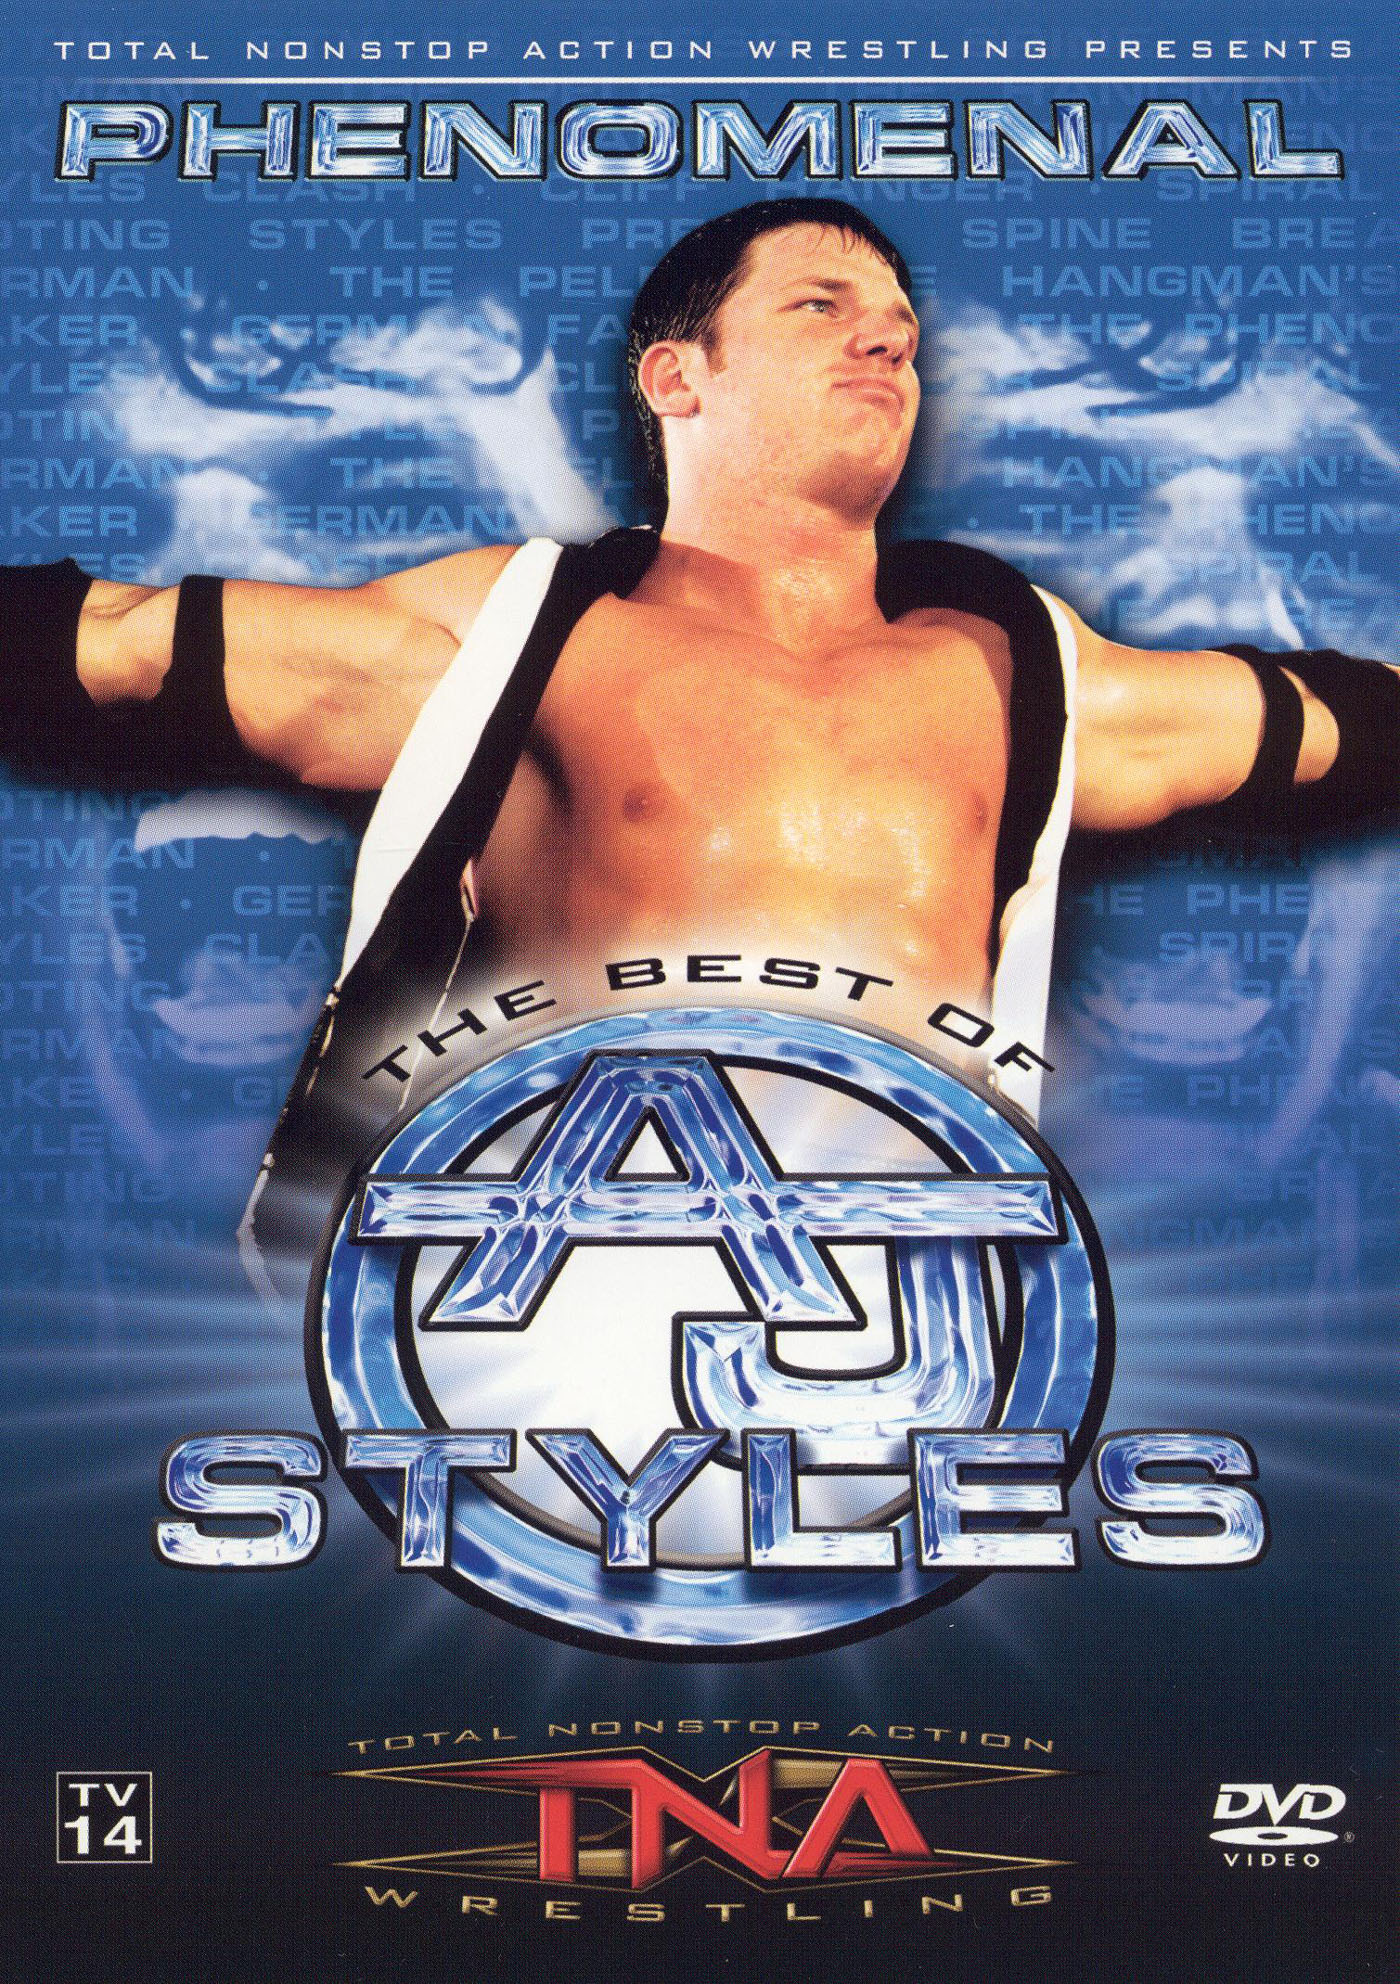 TNA Wrestling: Phenomenal - The Best of AJ Styles